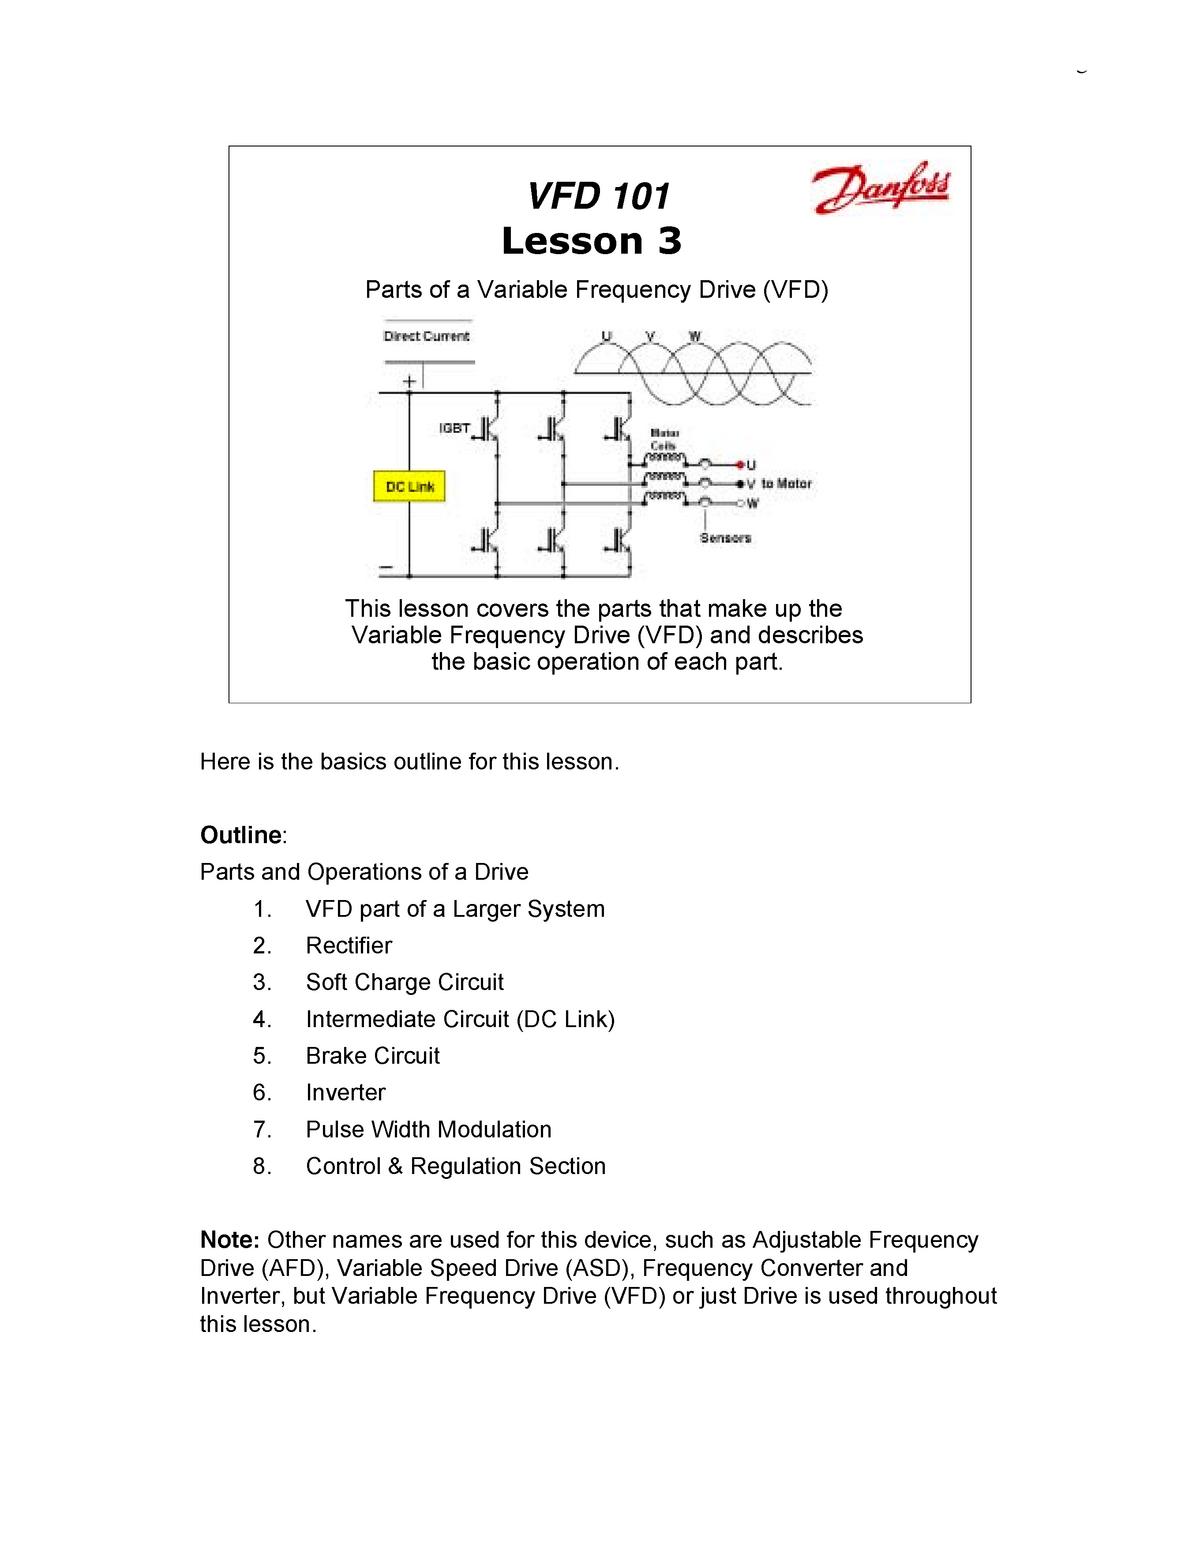 ENEL 472 VFD Lessons - ENEL 472: Power Systems Fundamentals - StuDocu